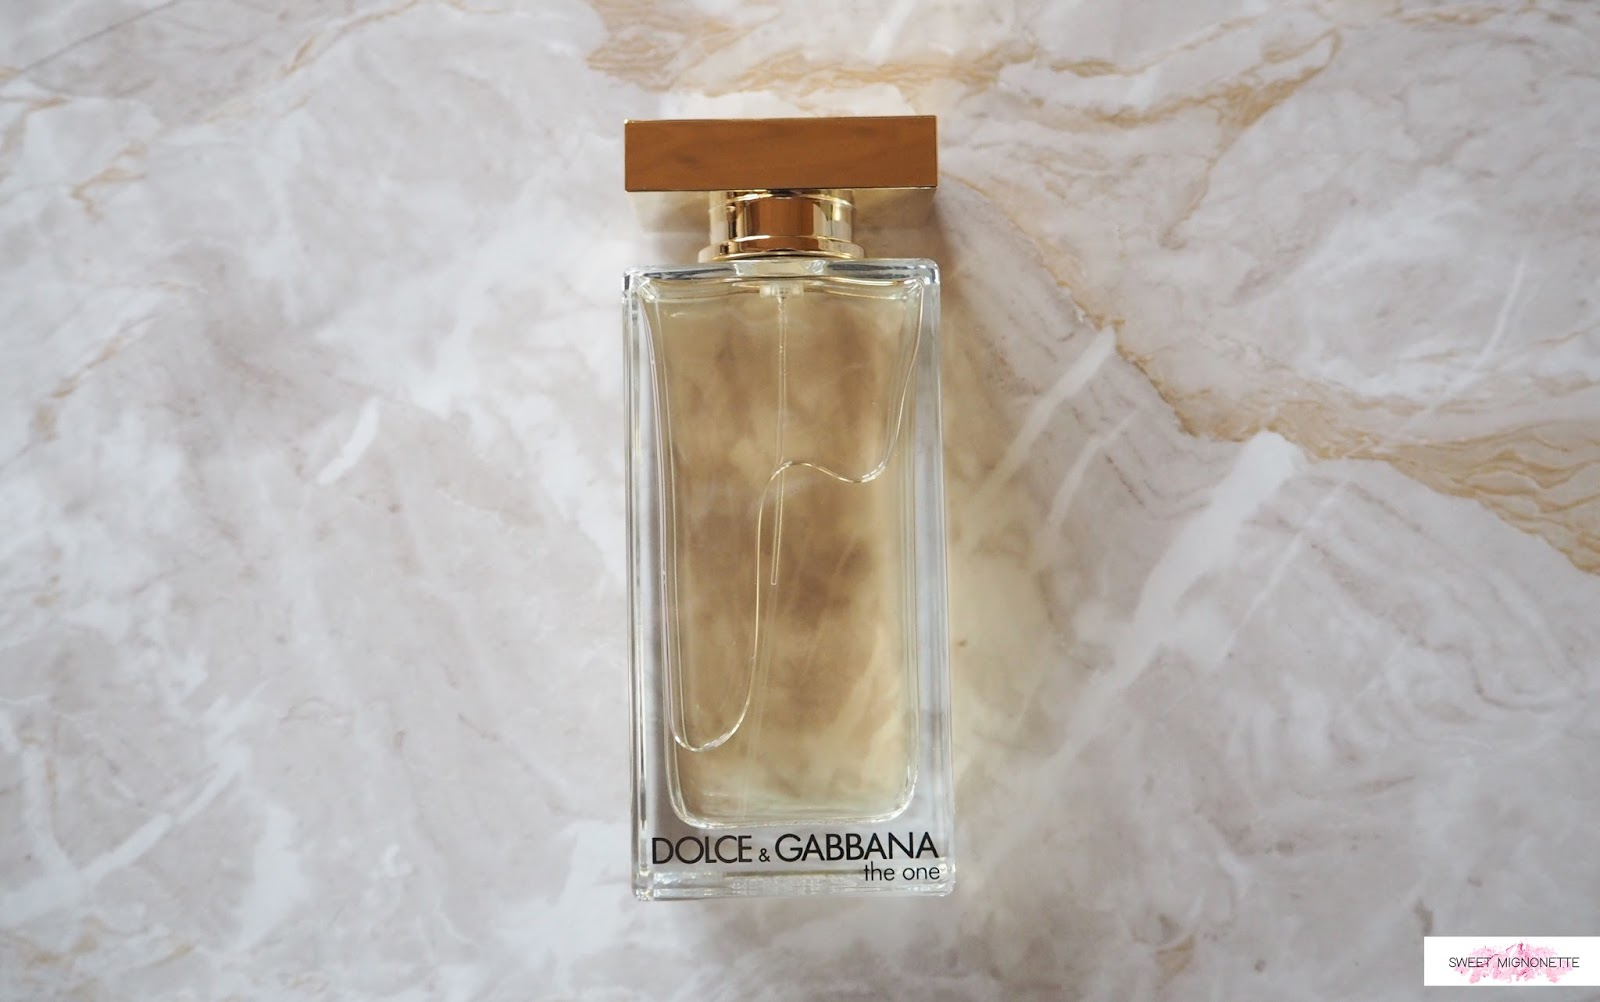 Parfum One Un Blog Dolceamp; Look The ⎮ Gabbana Suisse KJTulF1c3